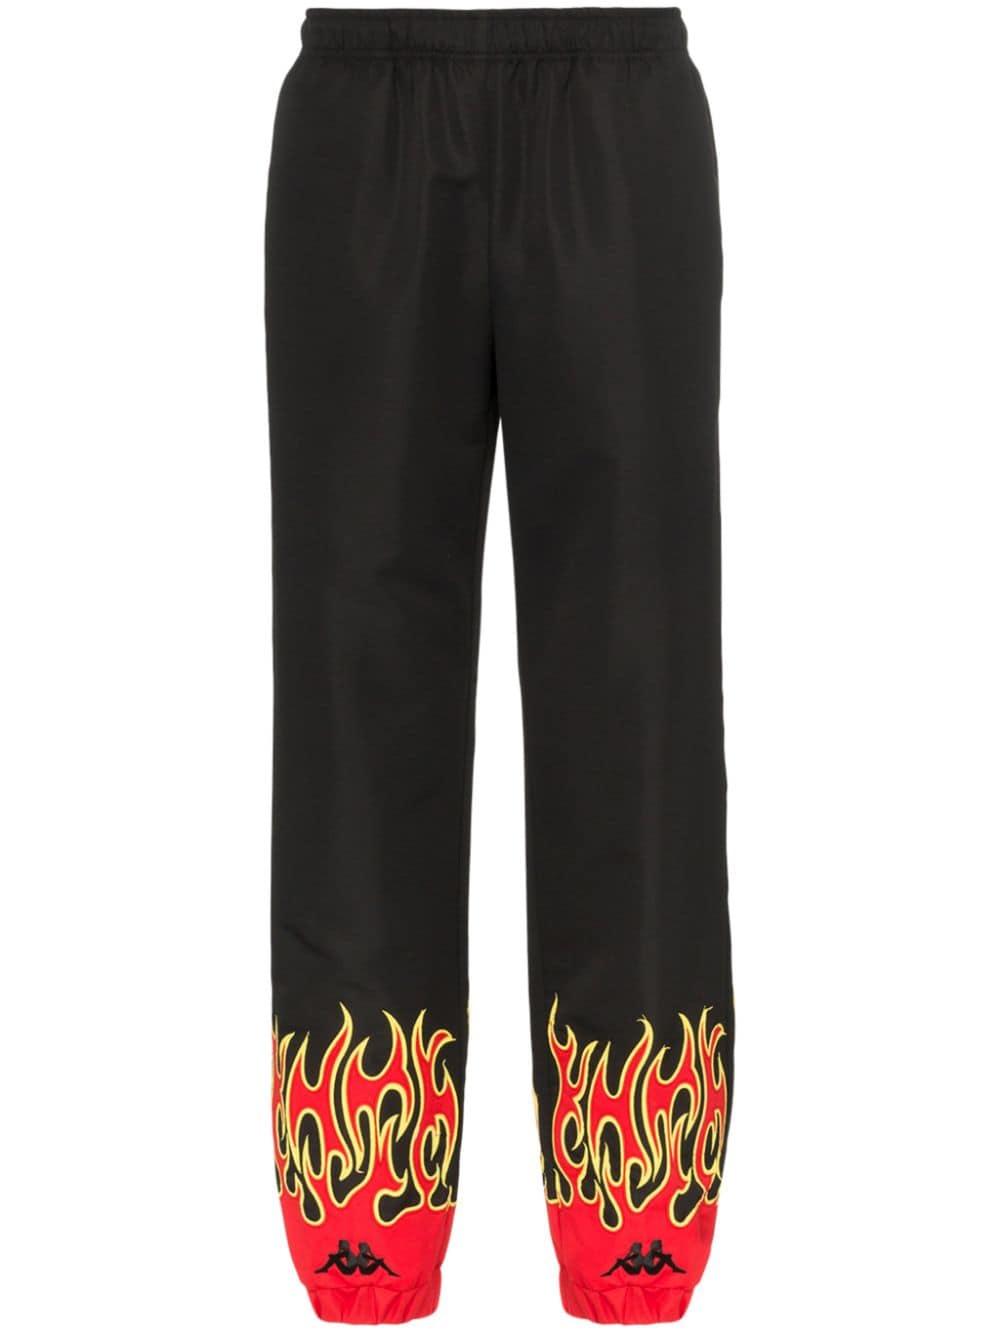 Charm's Fire Print Sweatpants | Pants, Sweatpants, Black pants